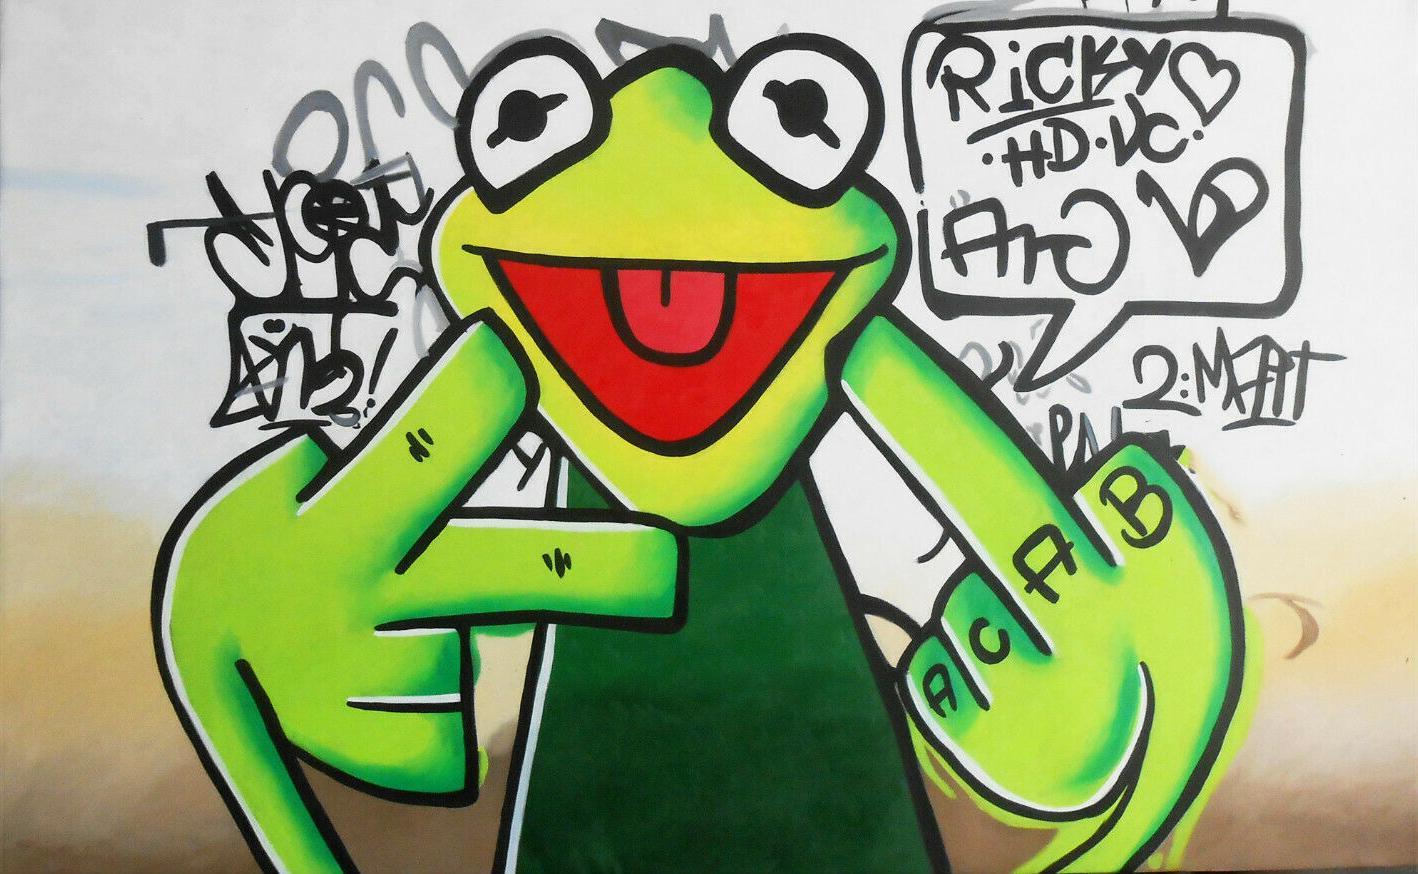 KUNST-ÖLGEMÄLDE MODERN ABSTRACT Happy Frog Hauptdekor handgemaltes HD-Druck-Ölgemälde auf Leinwand-Wand-Kunst-Leinwandbilder 200706